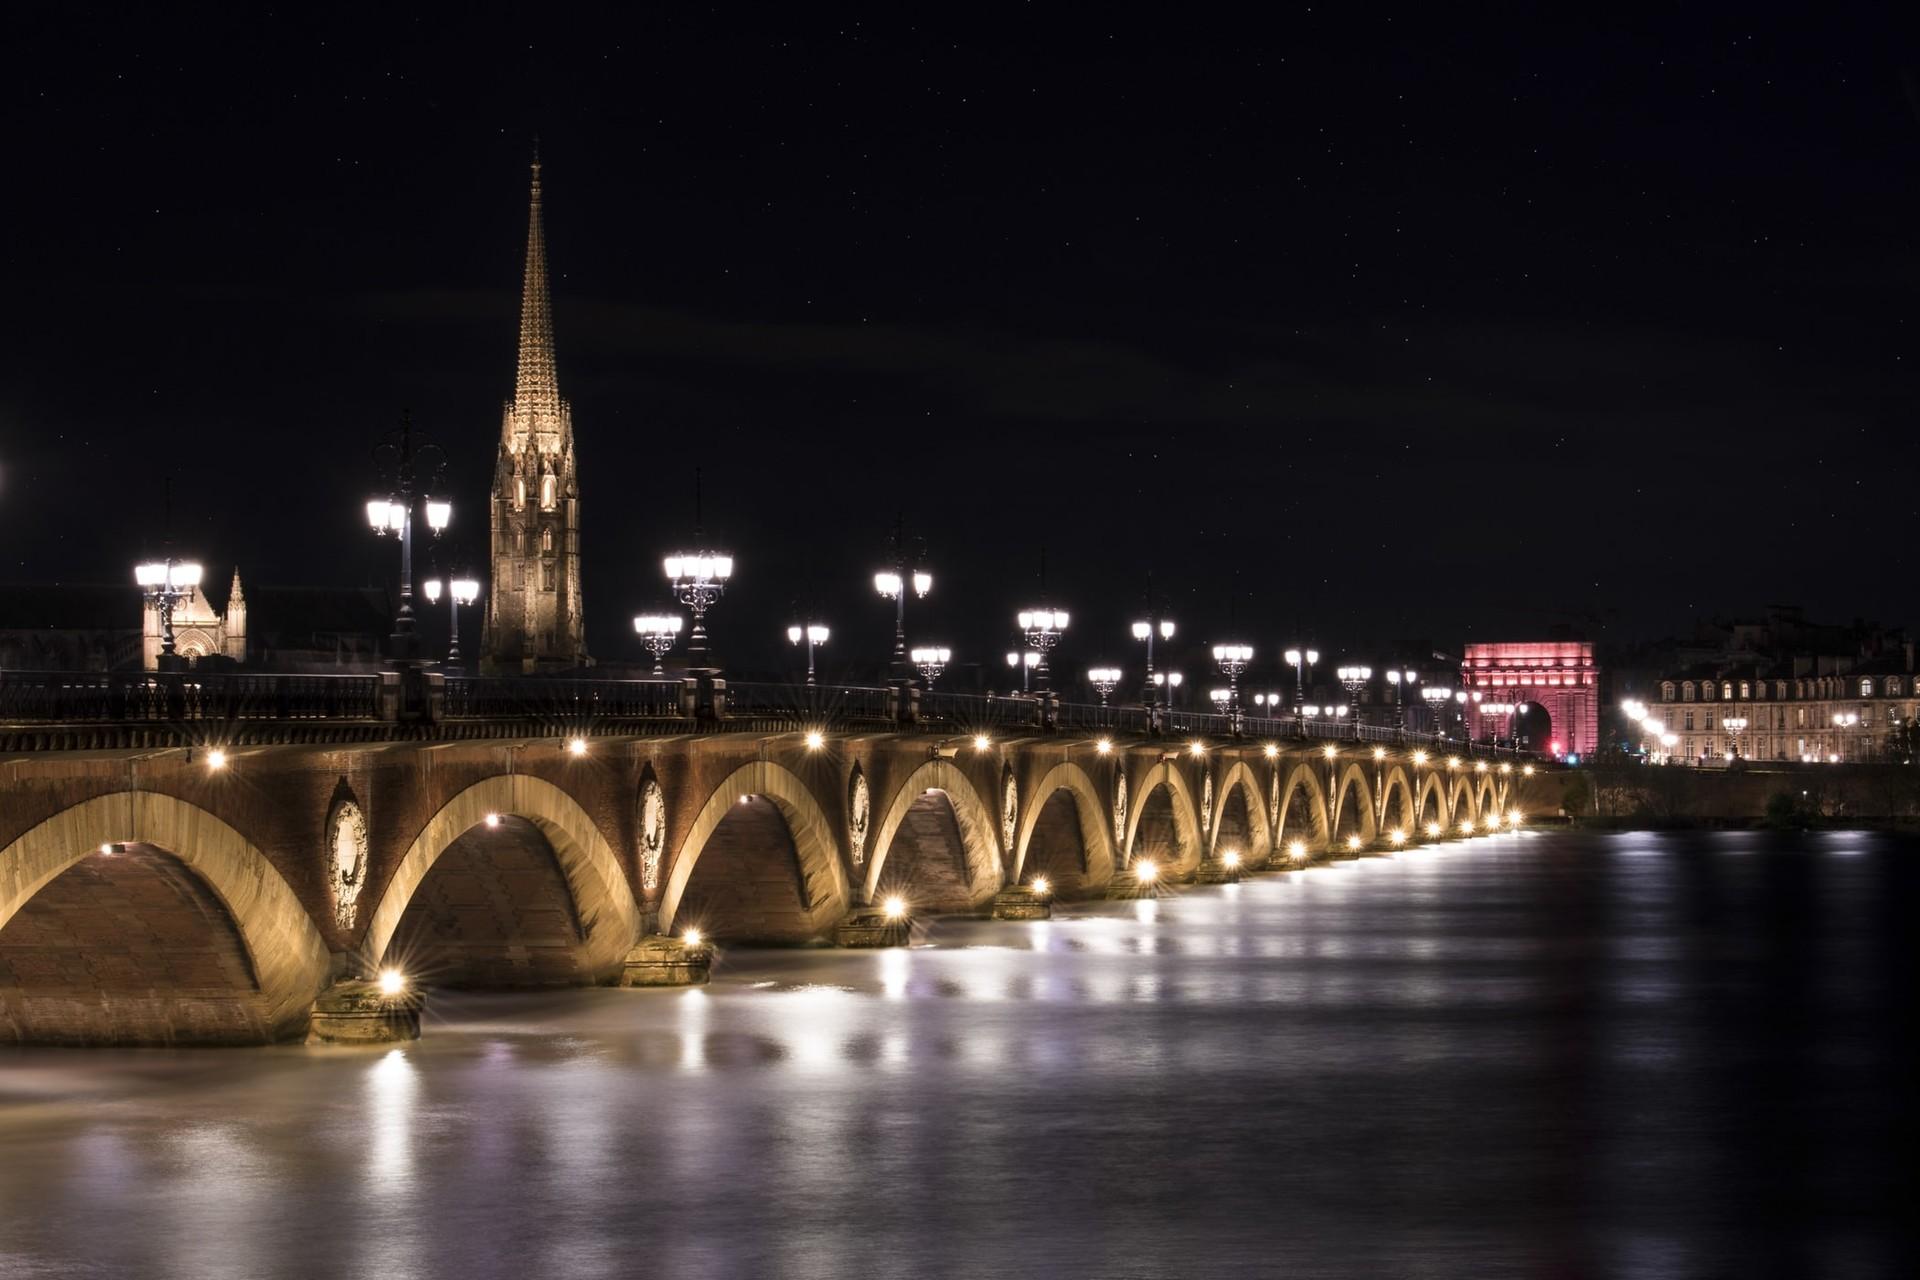 Esperienza Erasmus a Bordeaux, Francia di Chiara